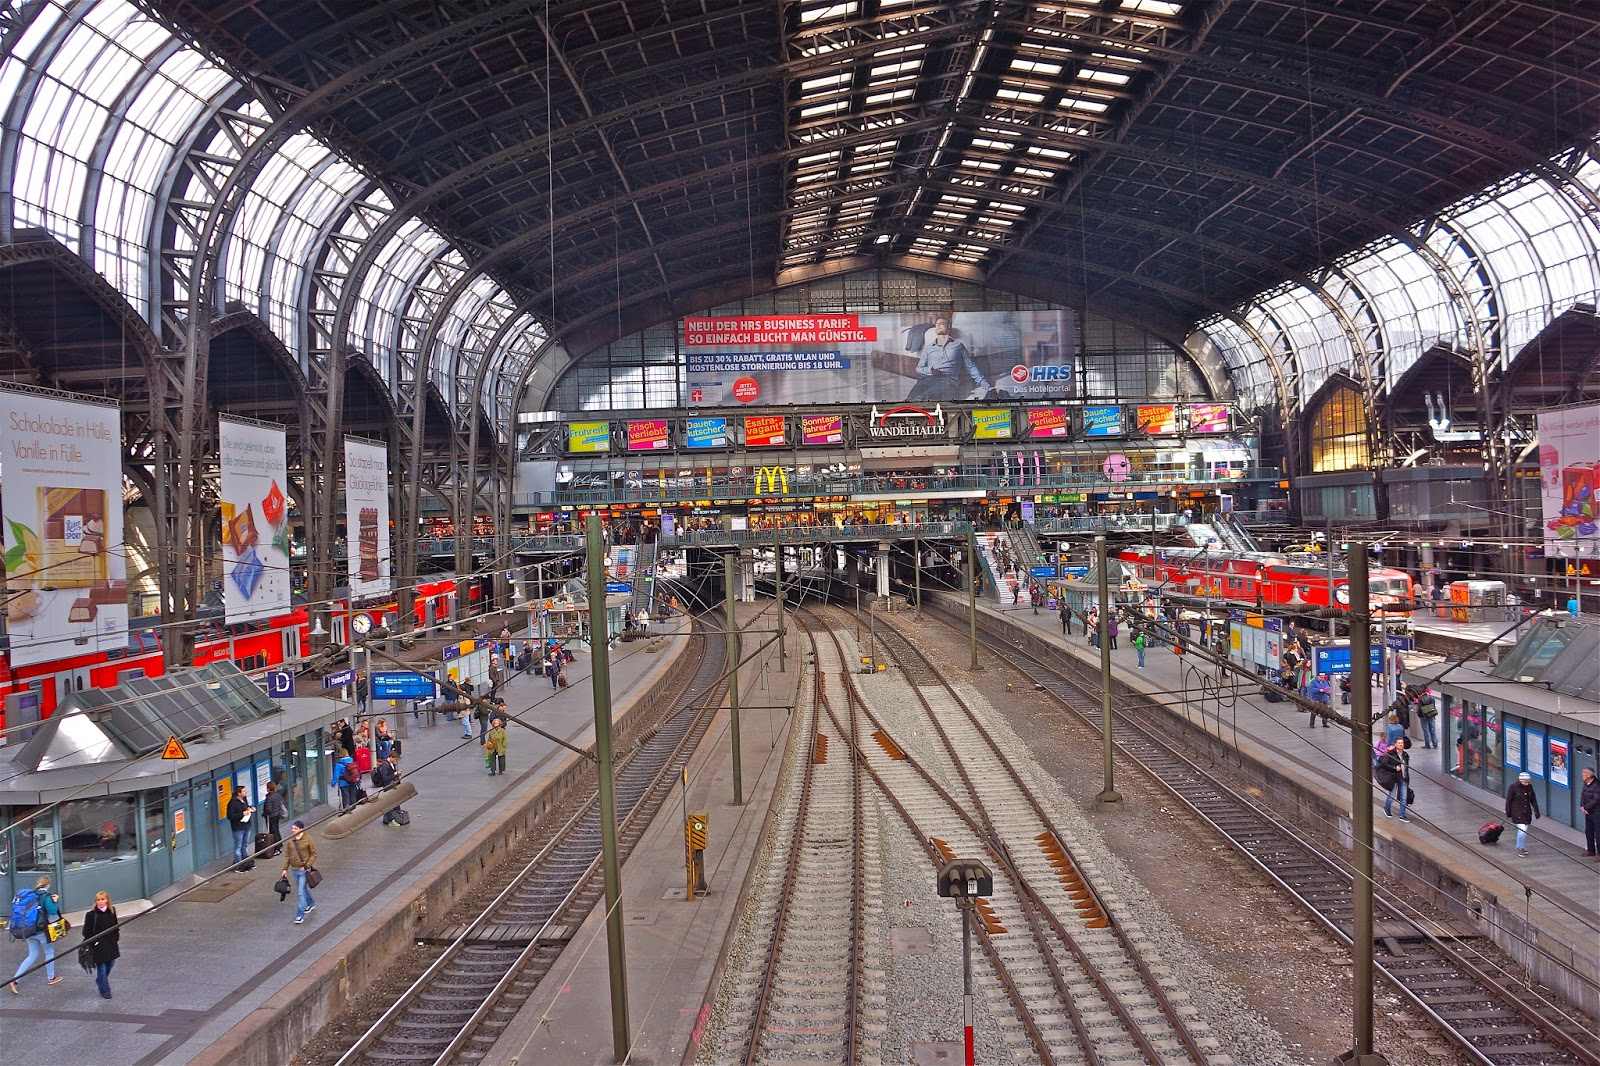 Hamburg Hauptbahnhof |Photoblog On-The-Go